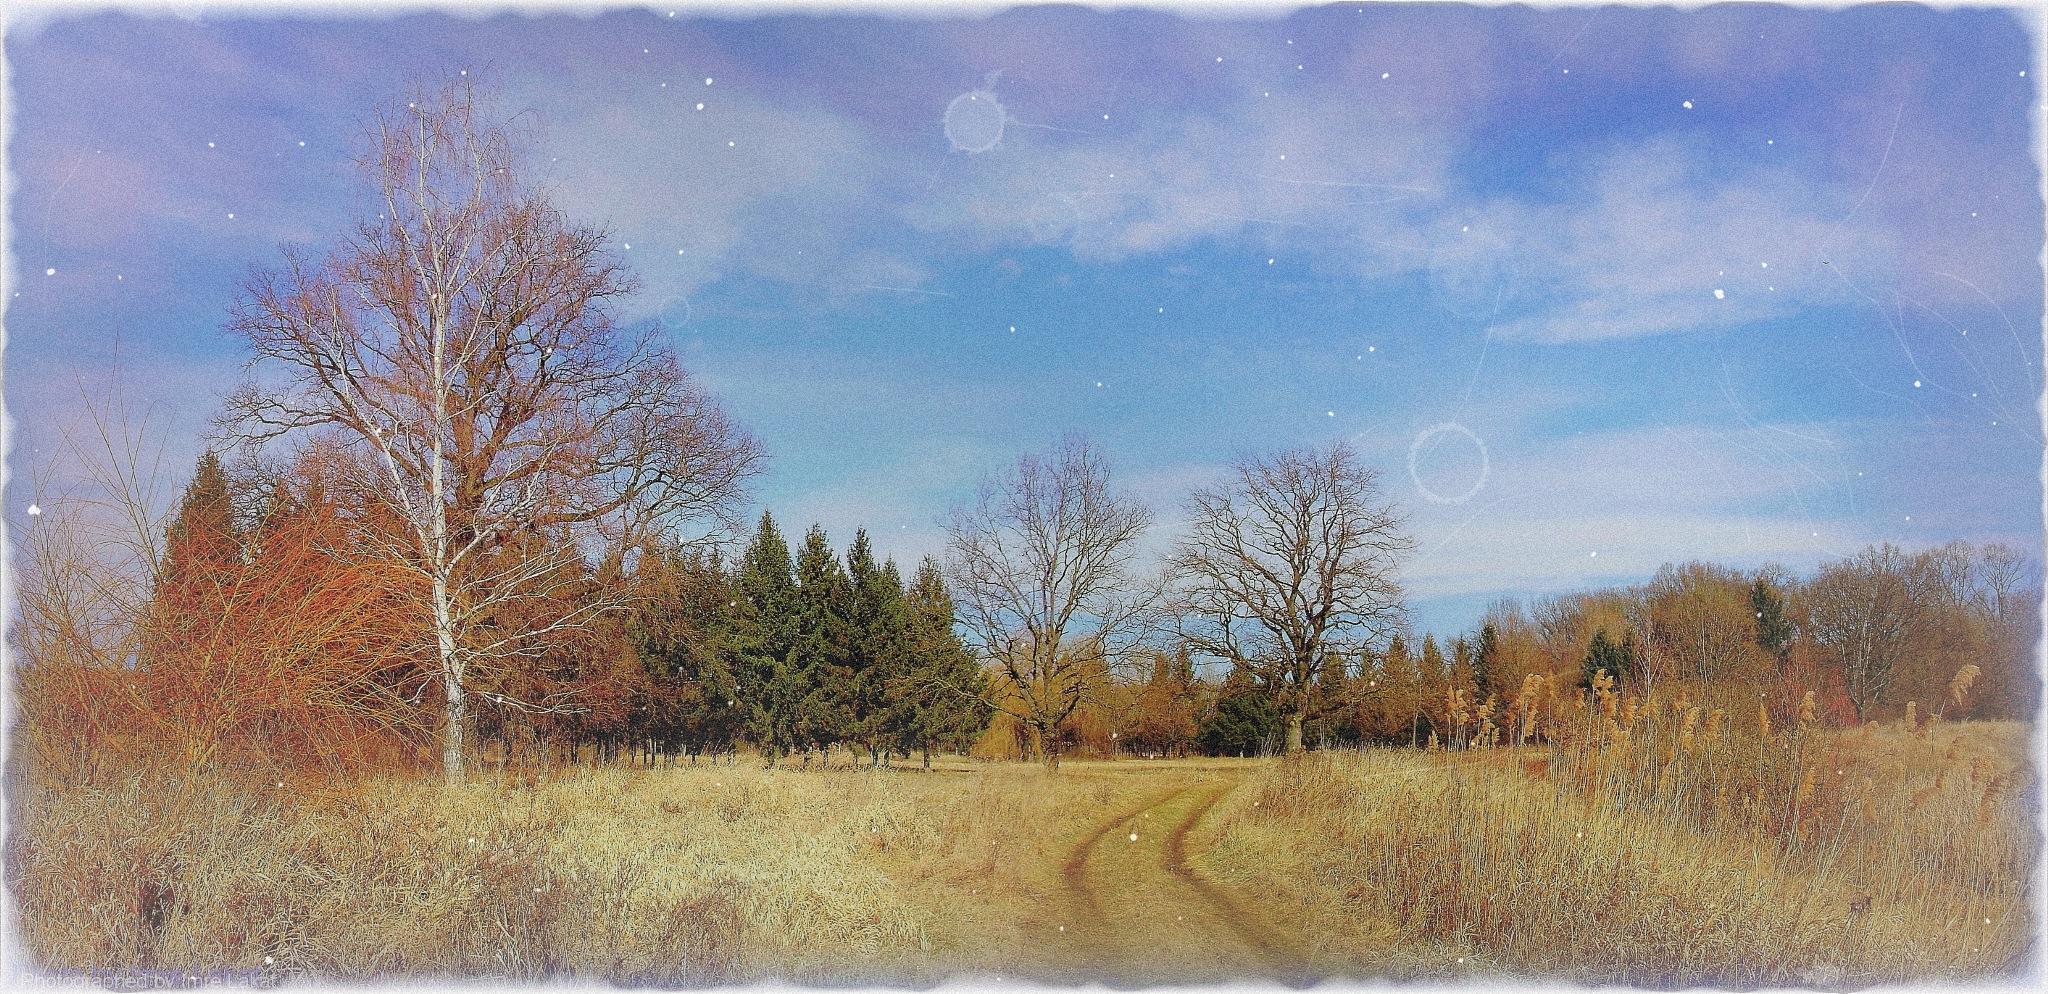 Landscape near Lenti city by Imre Lakat